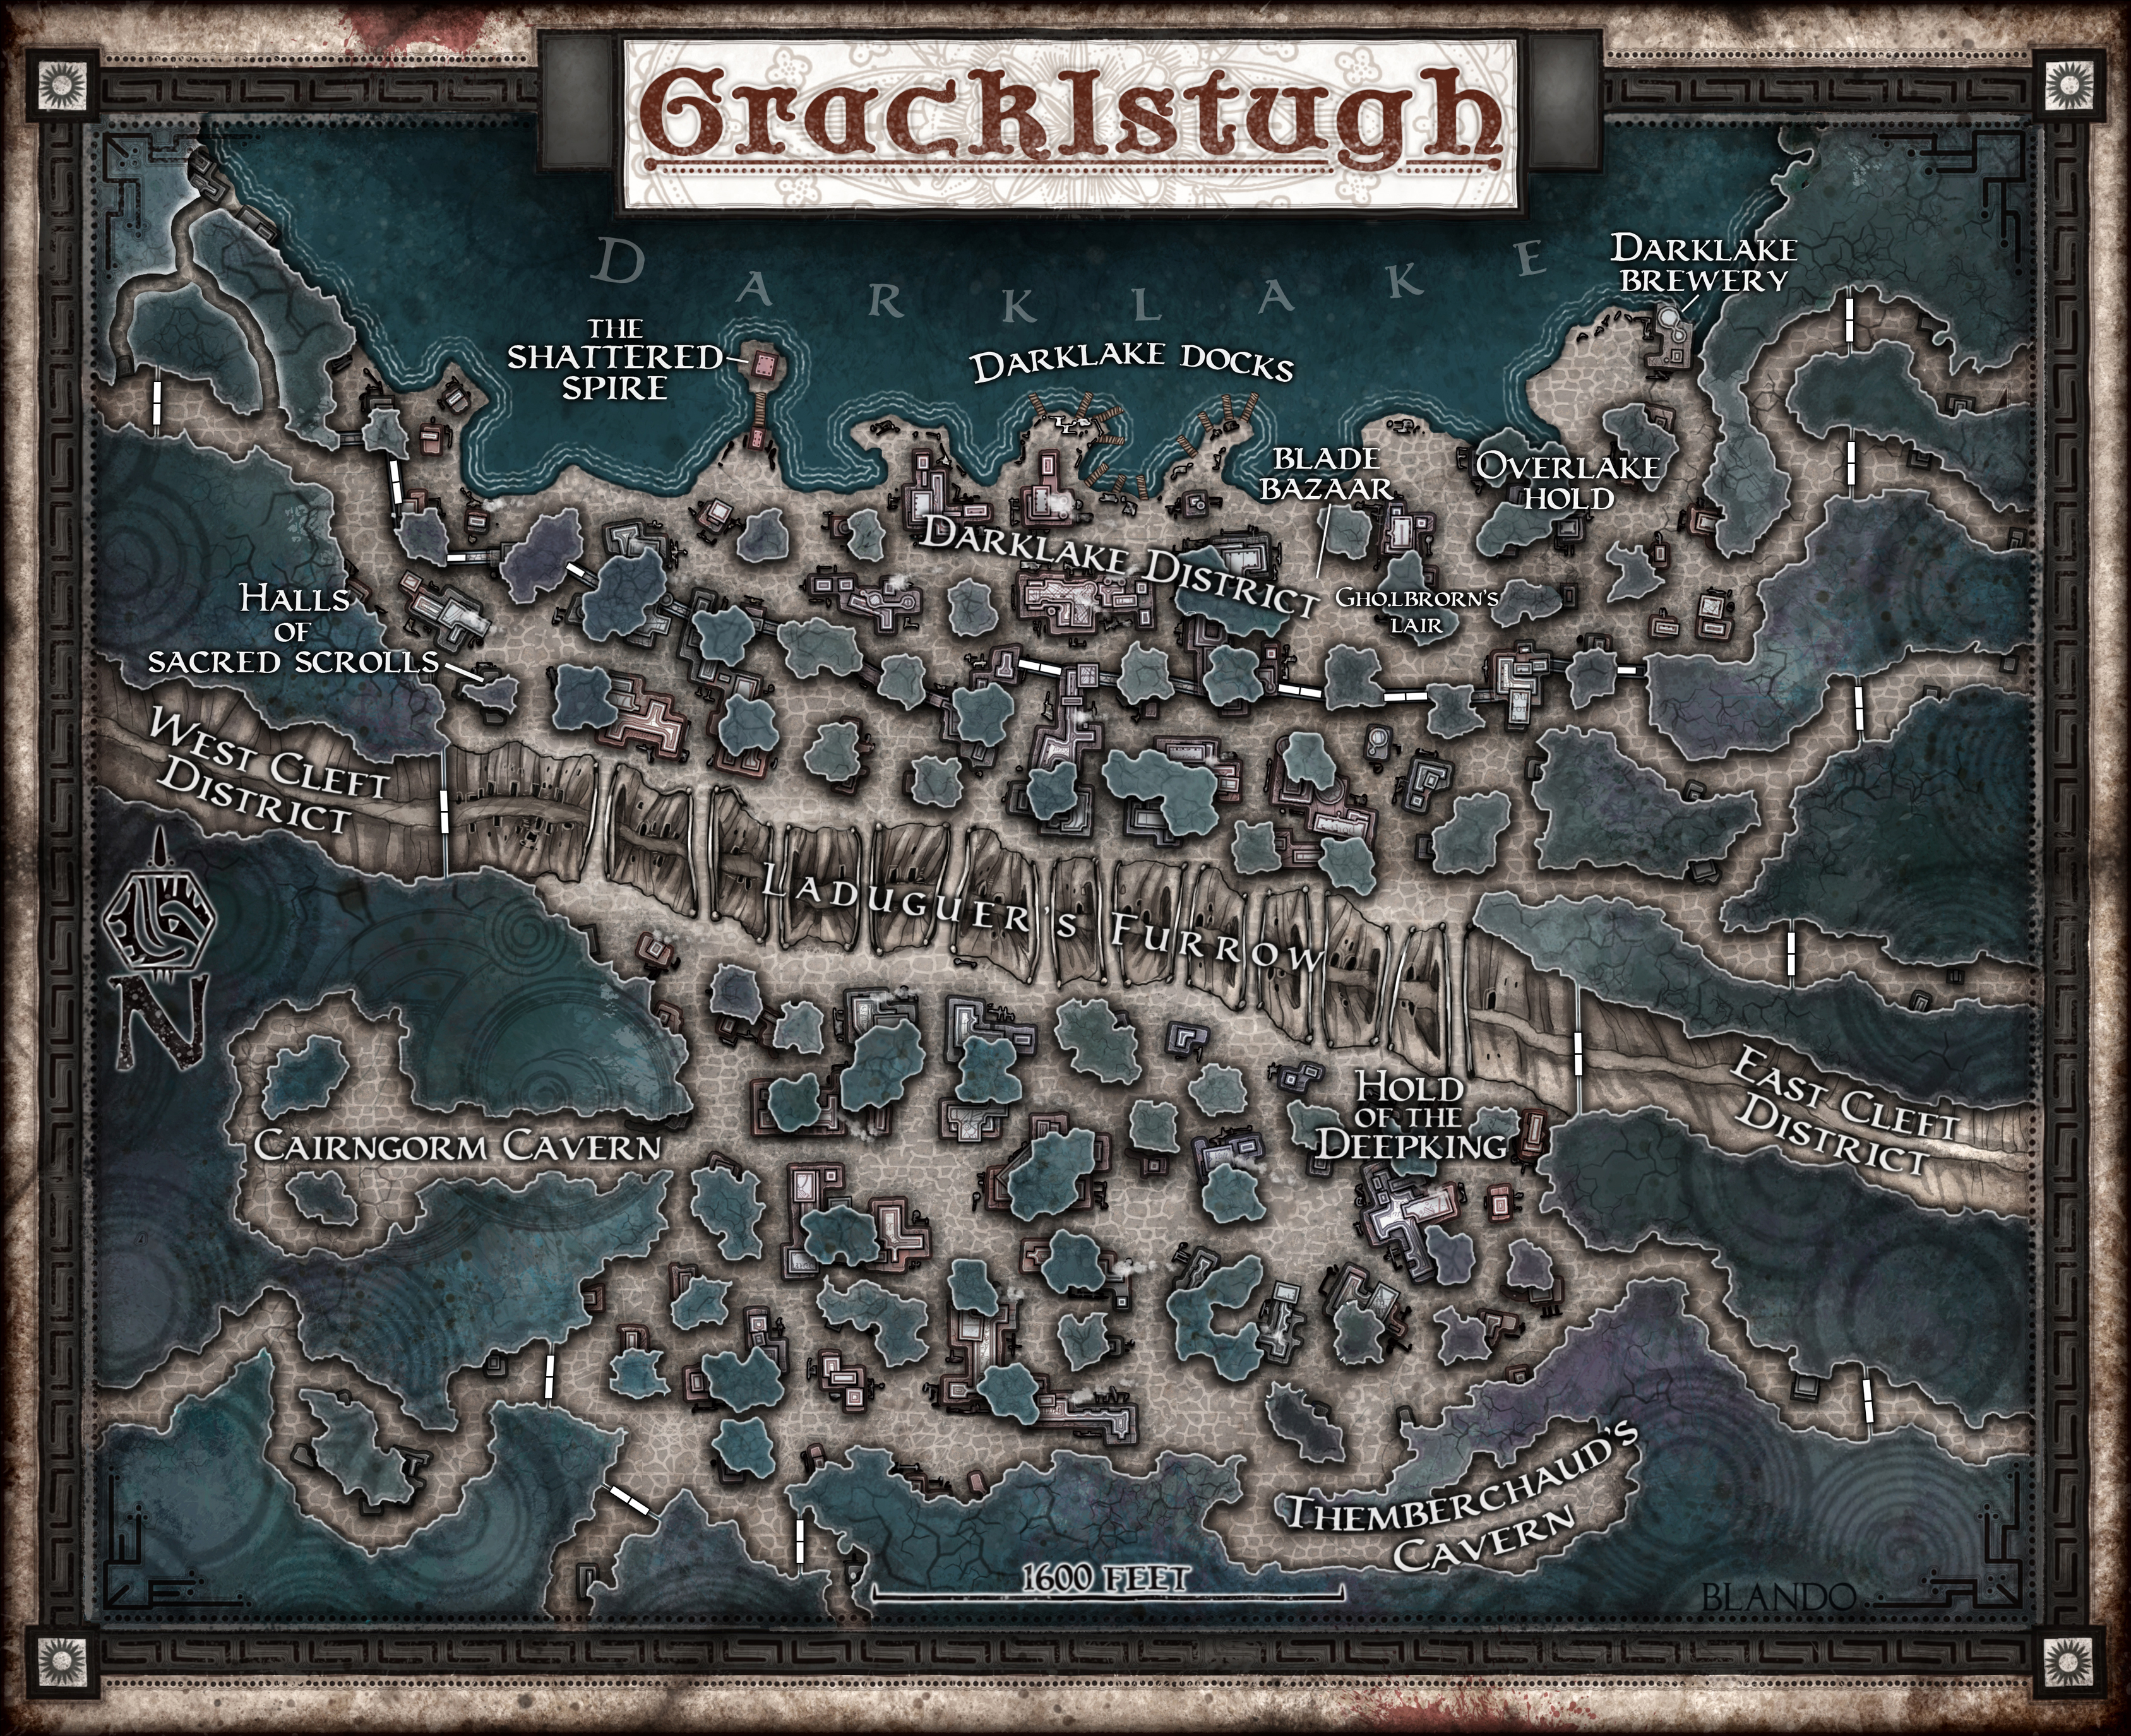 Gracklstugh_DM_Version.jpg